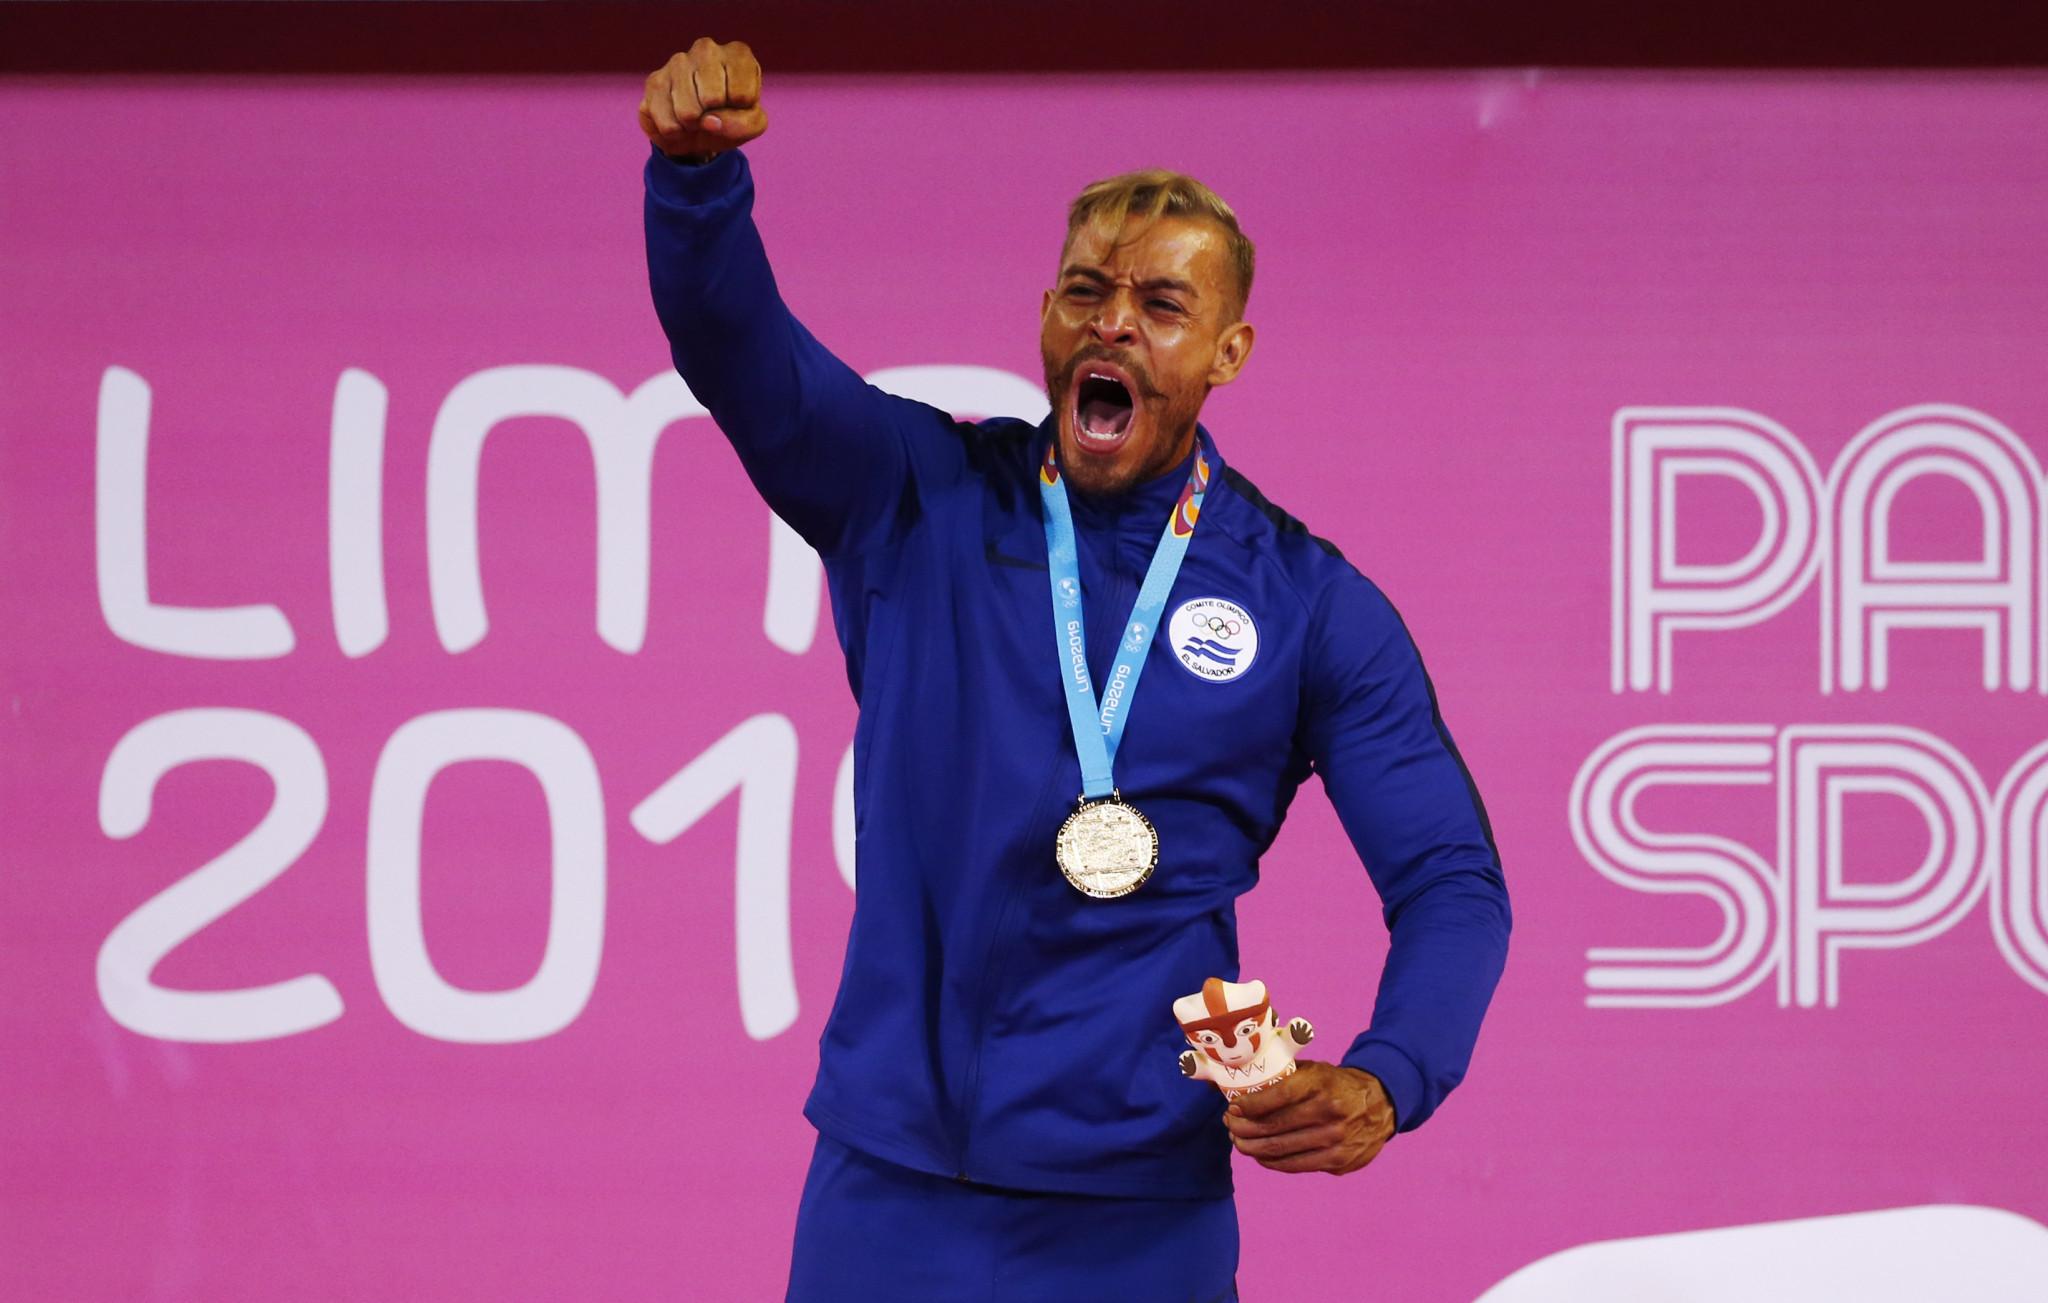 El Salvador won both golds ©Lima 2019